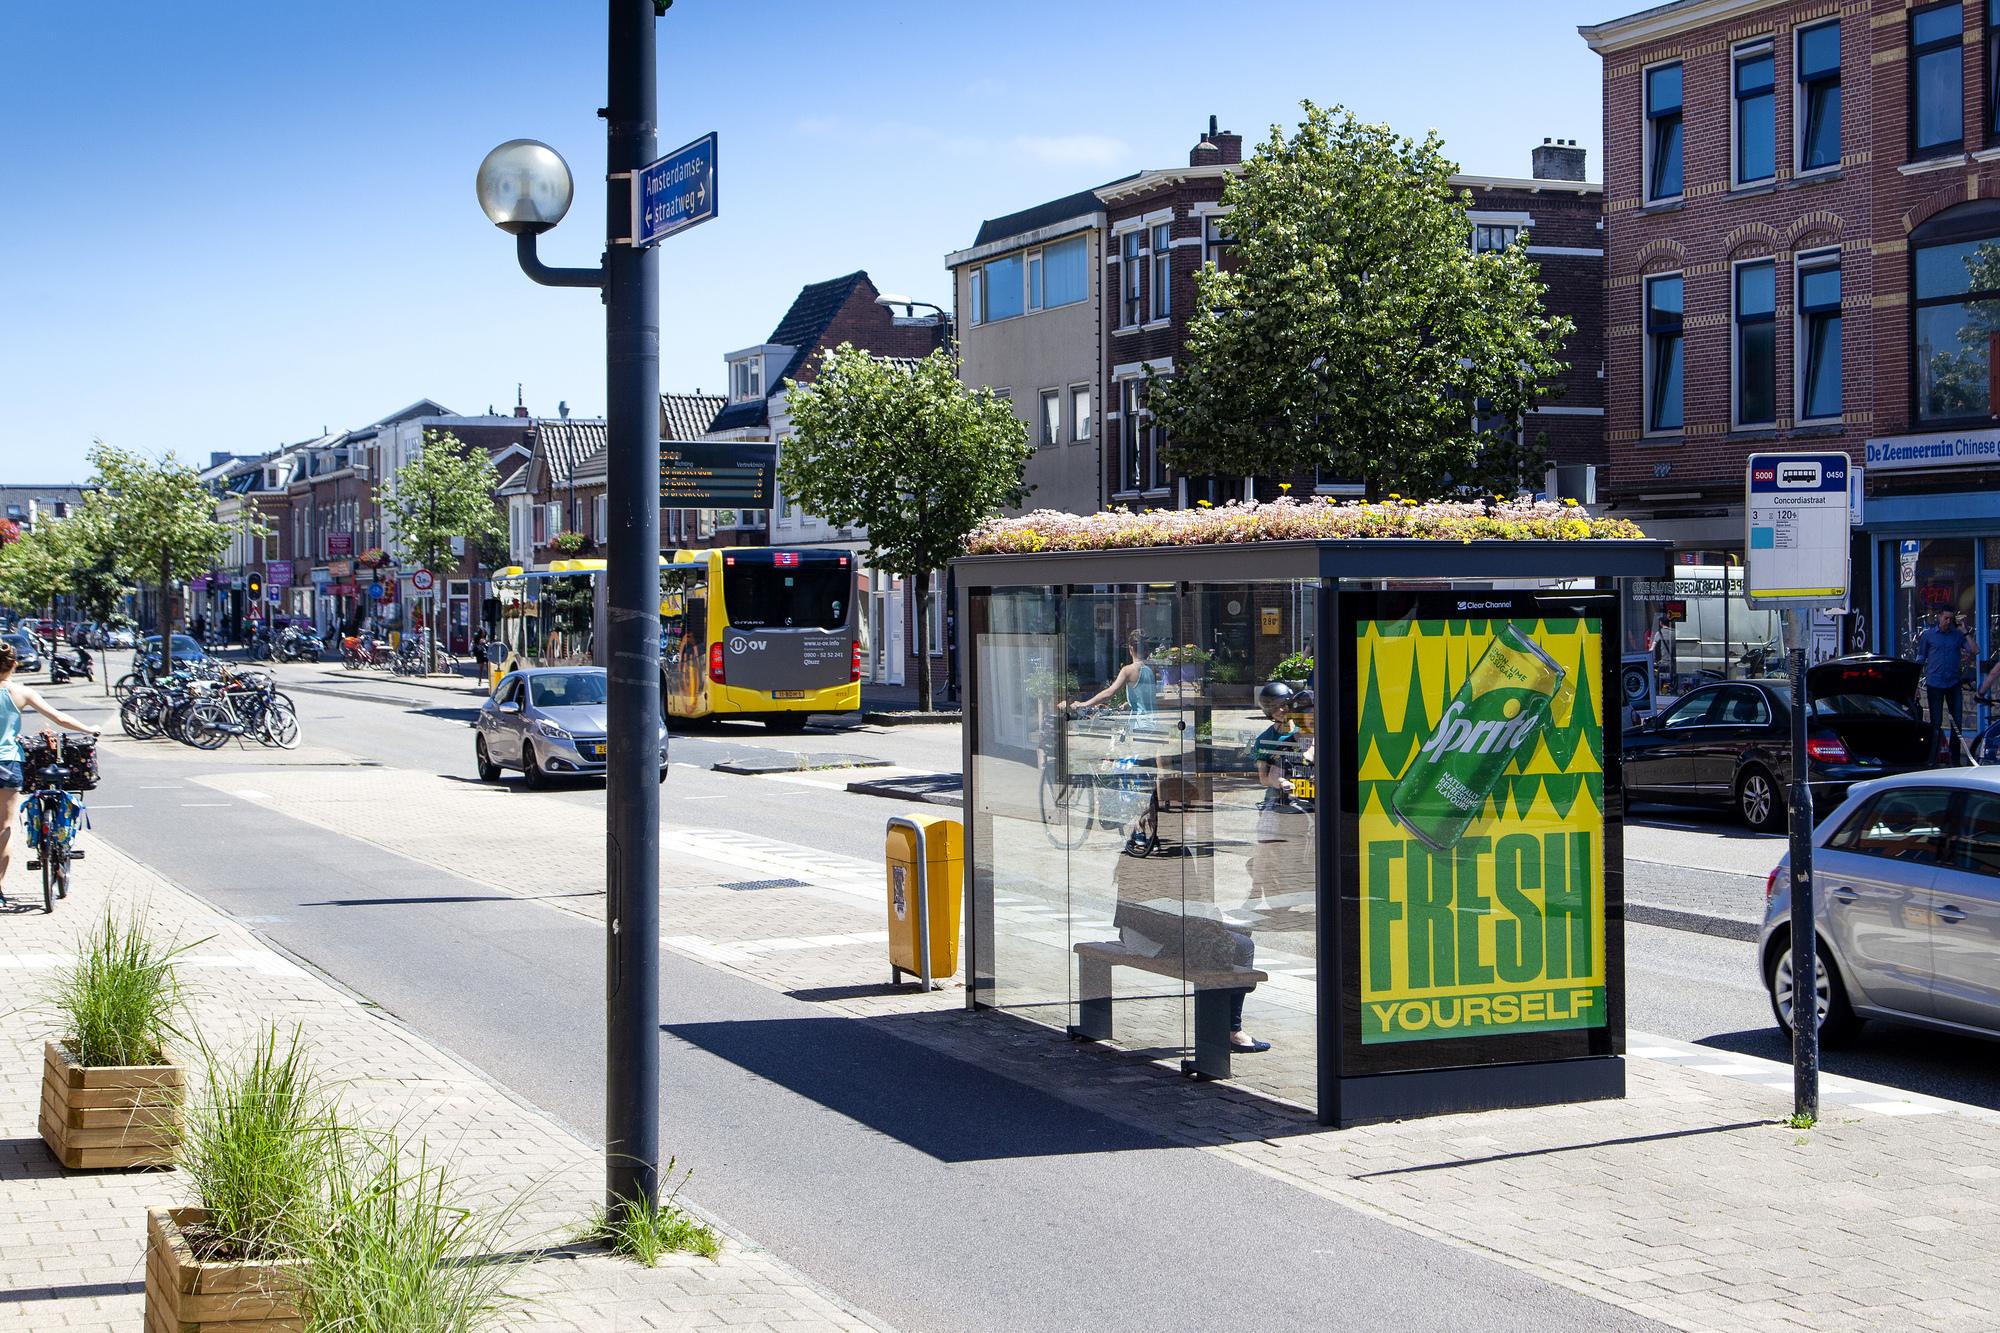 Utrecht crea 300 paradas de autobuses con techos verdes para abejas |  Plataforma Arquitectura